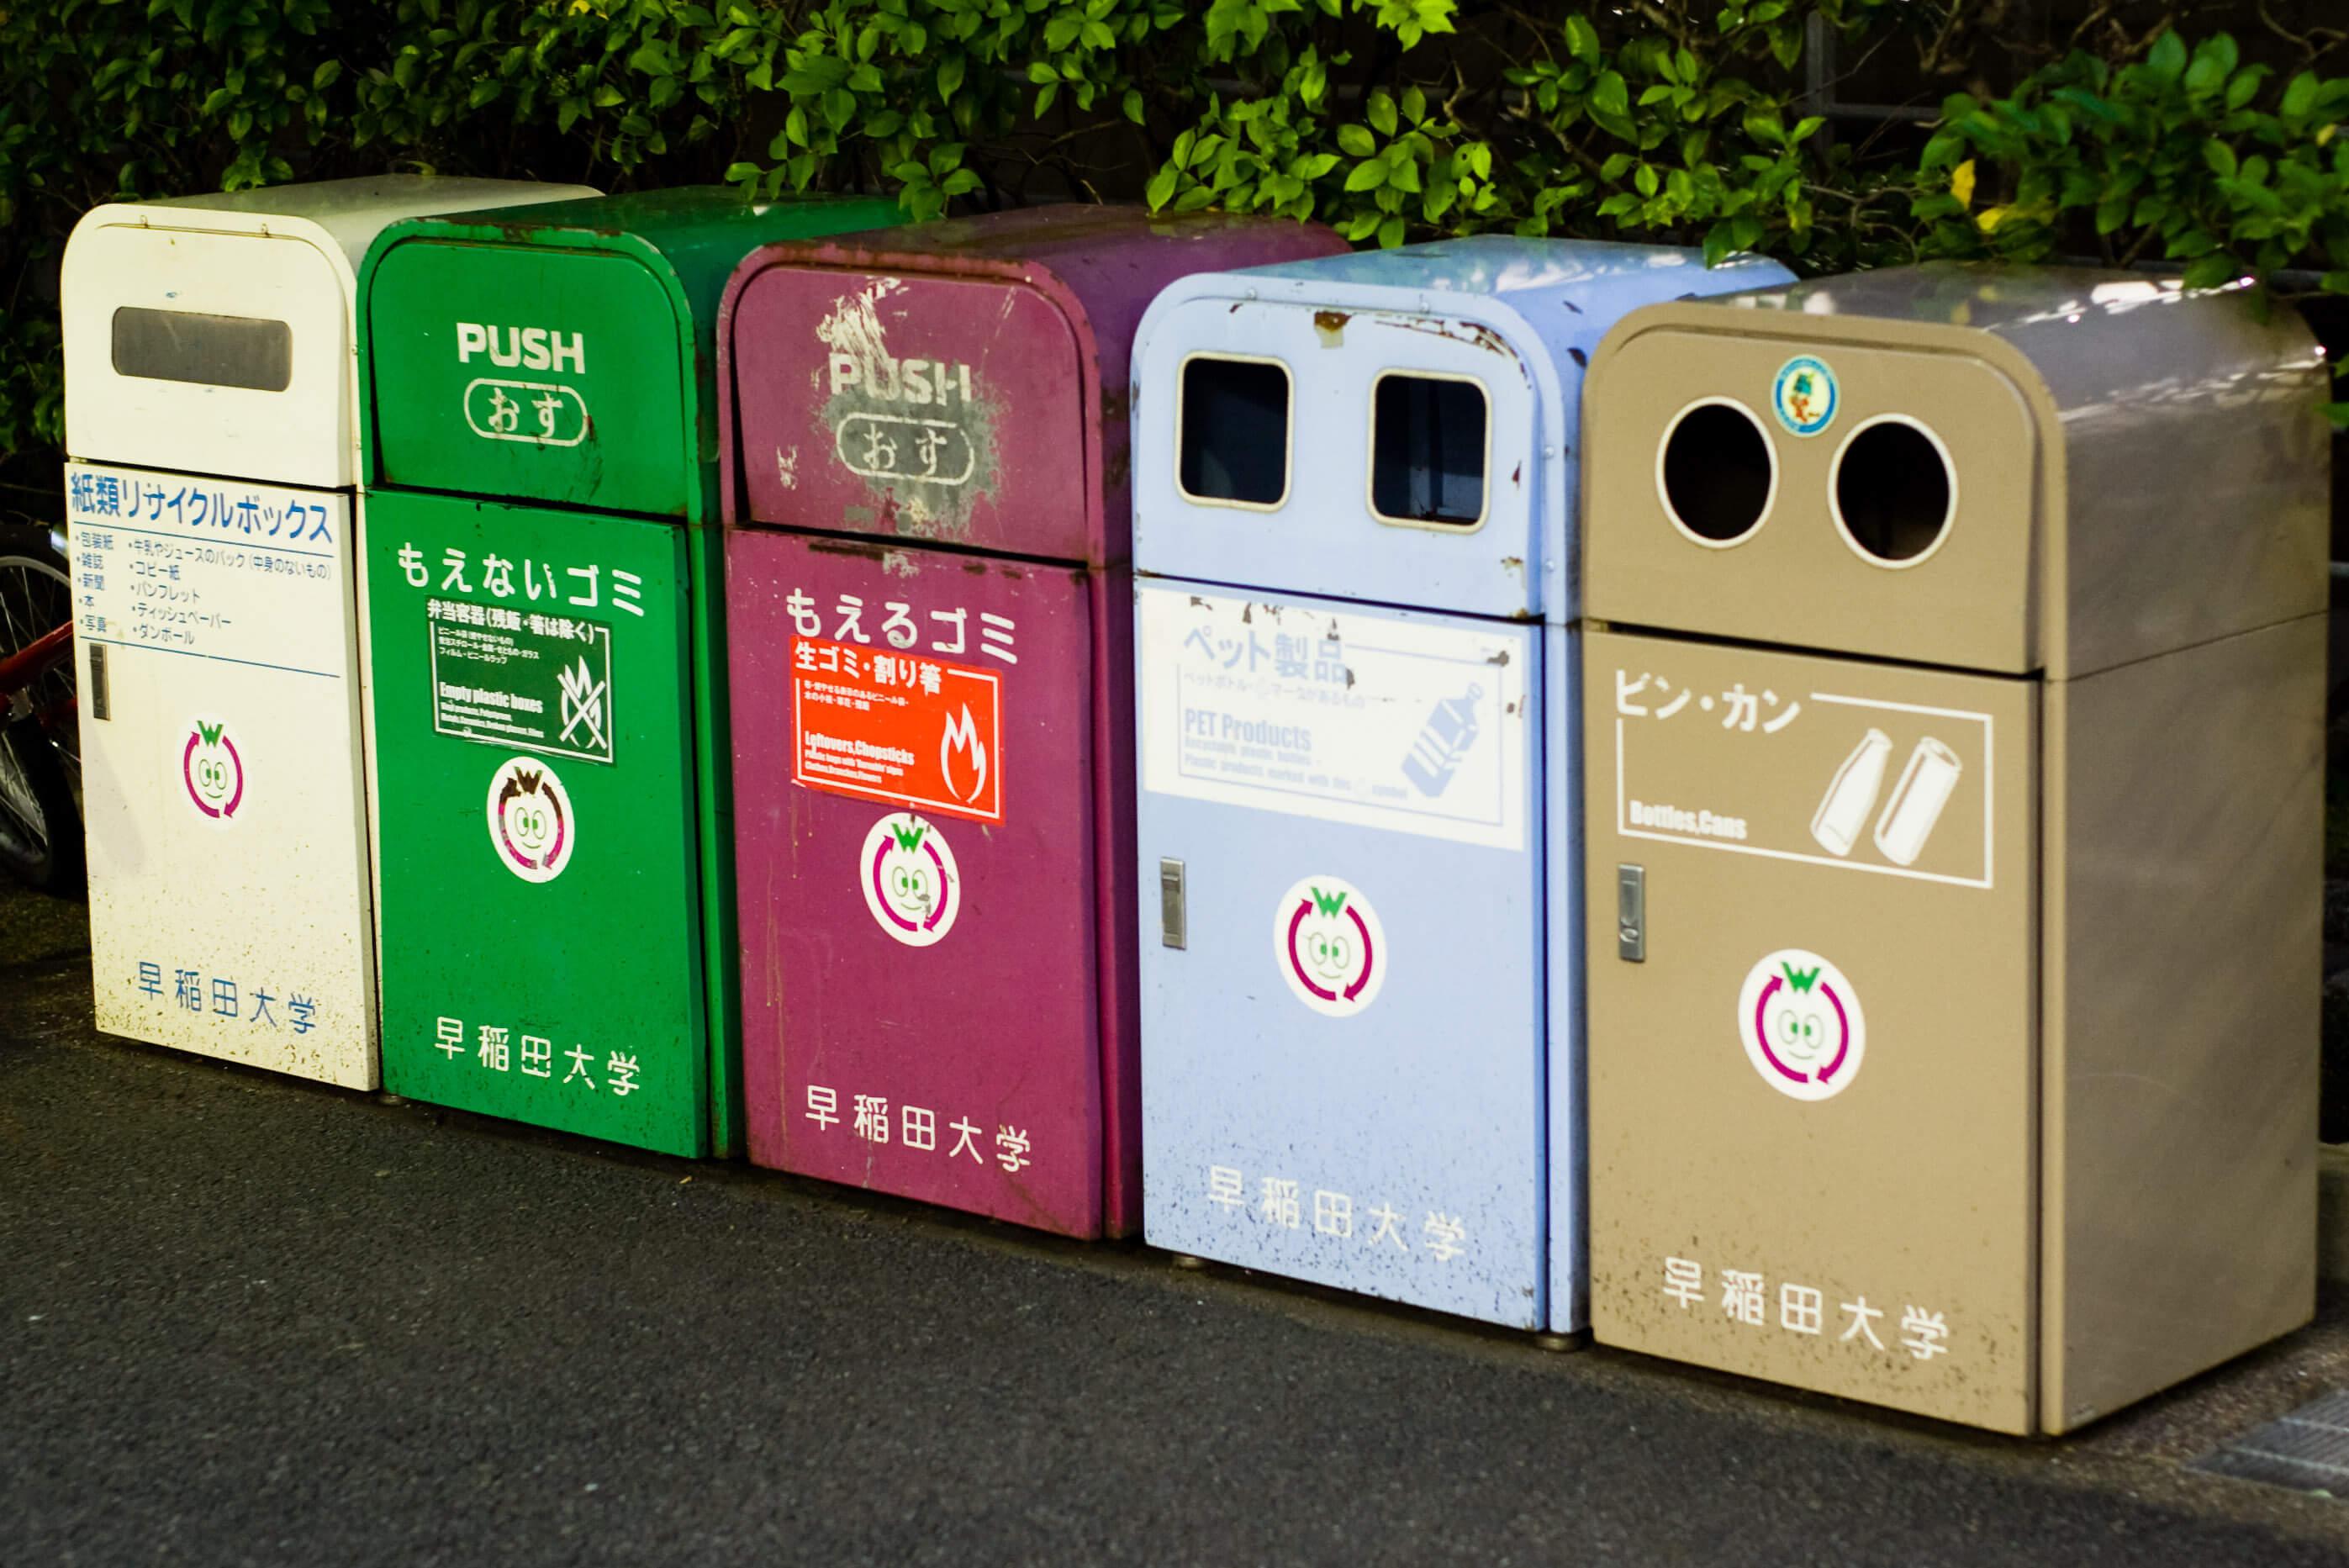 The Future of Cities: Creating Zero Waste